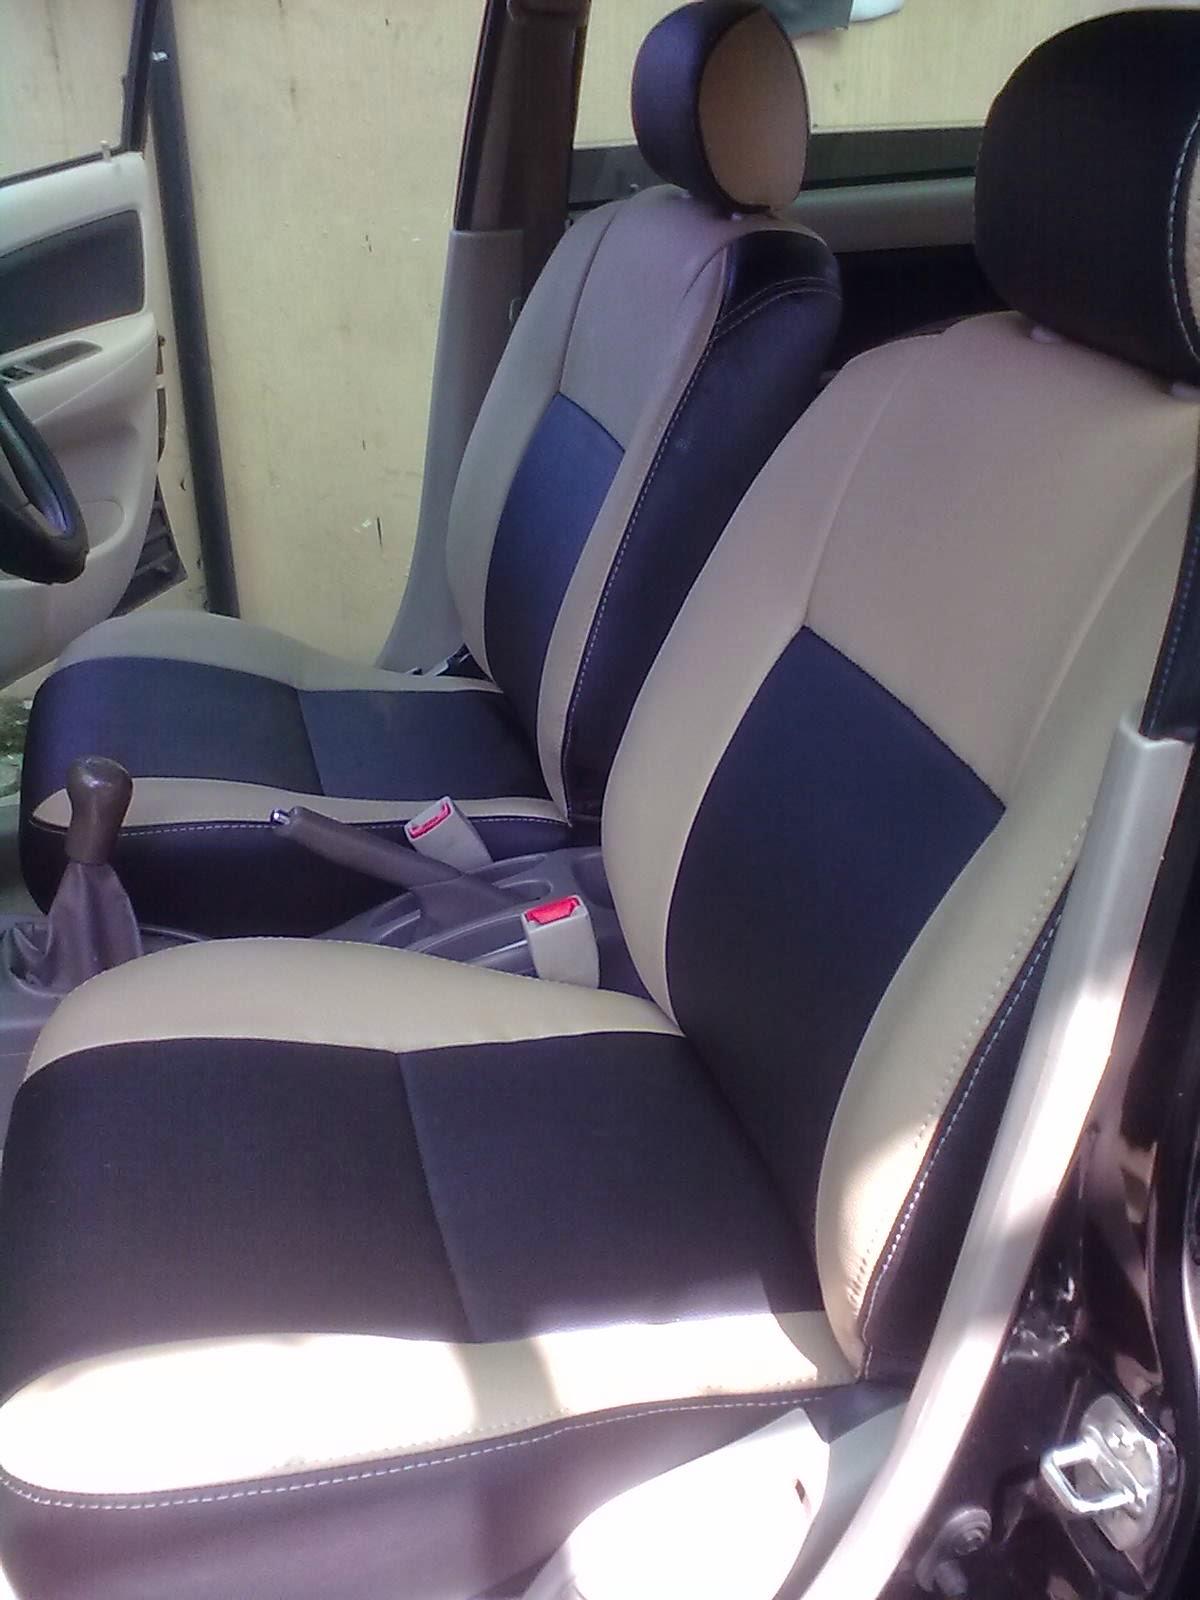 Jok Grand New Avanza Veloz 1.5 Putih Sarung Mobil Mbtech Iguana Champignon Medan